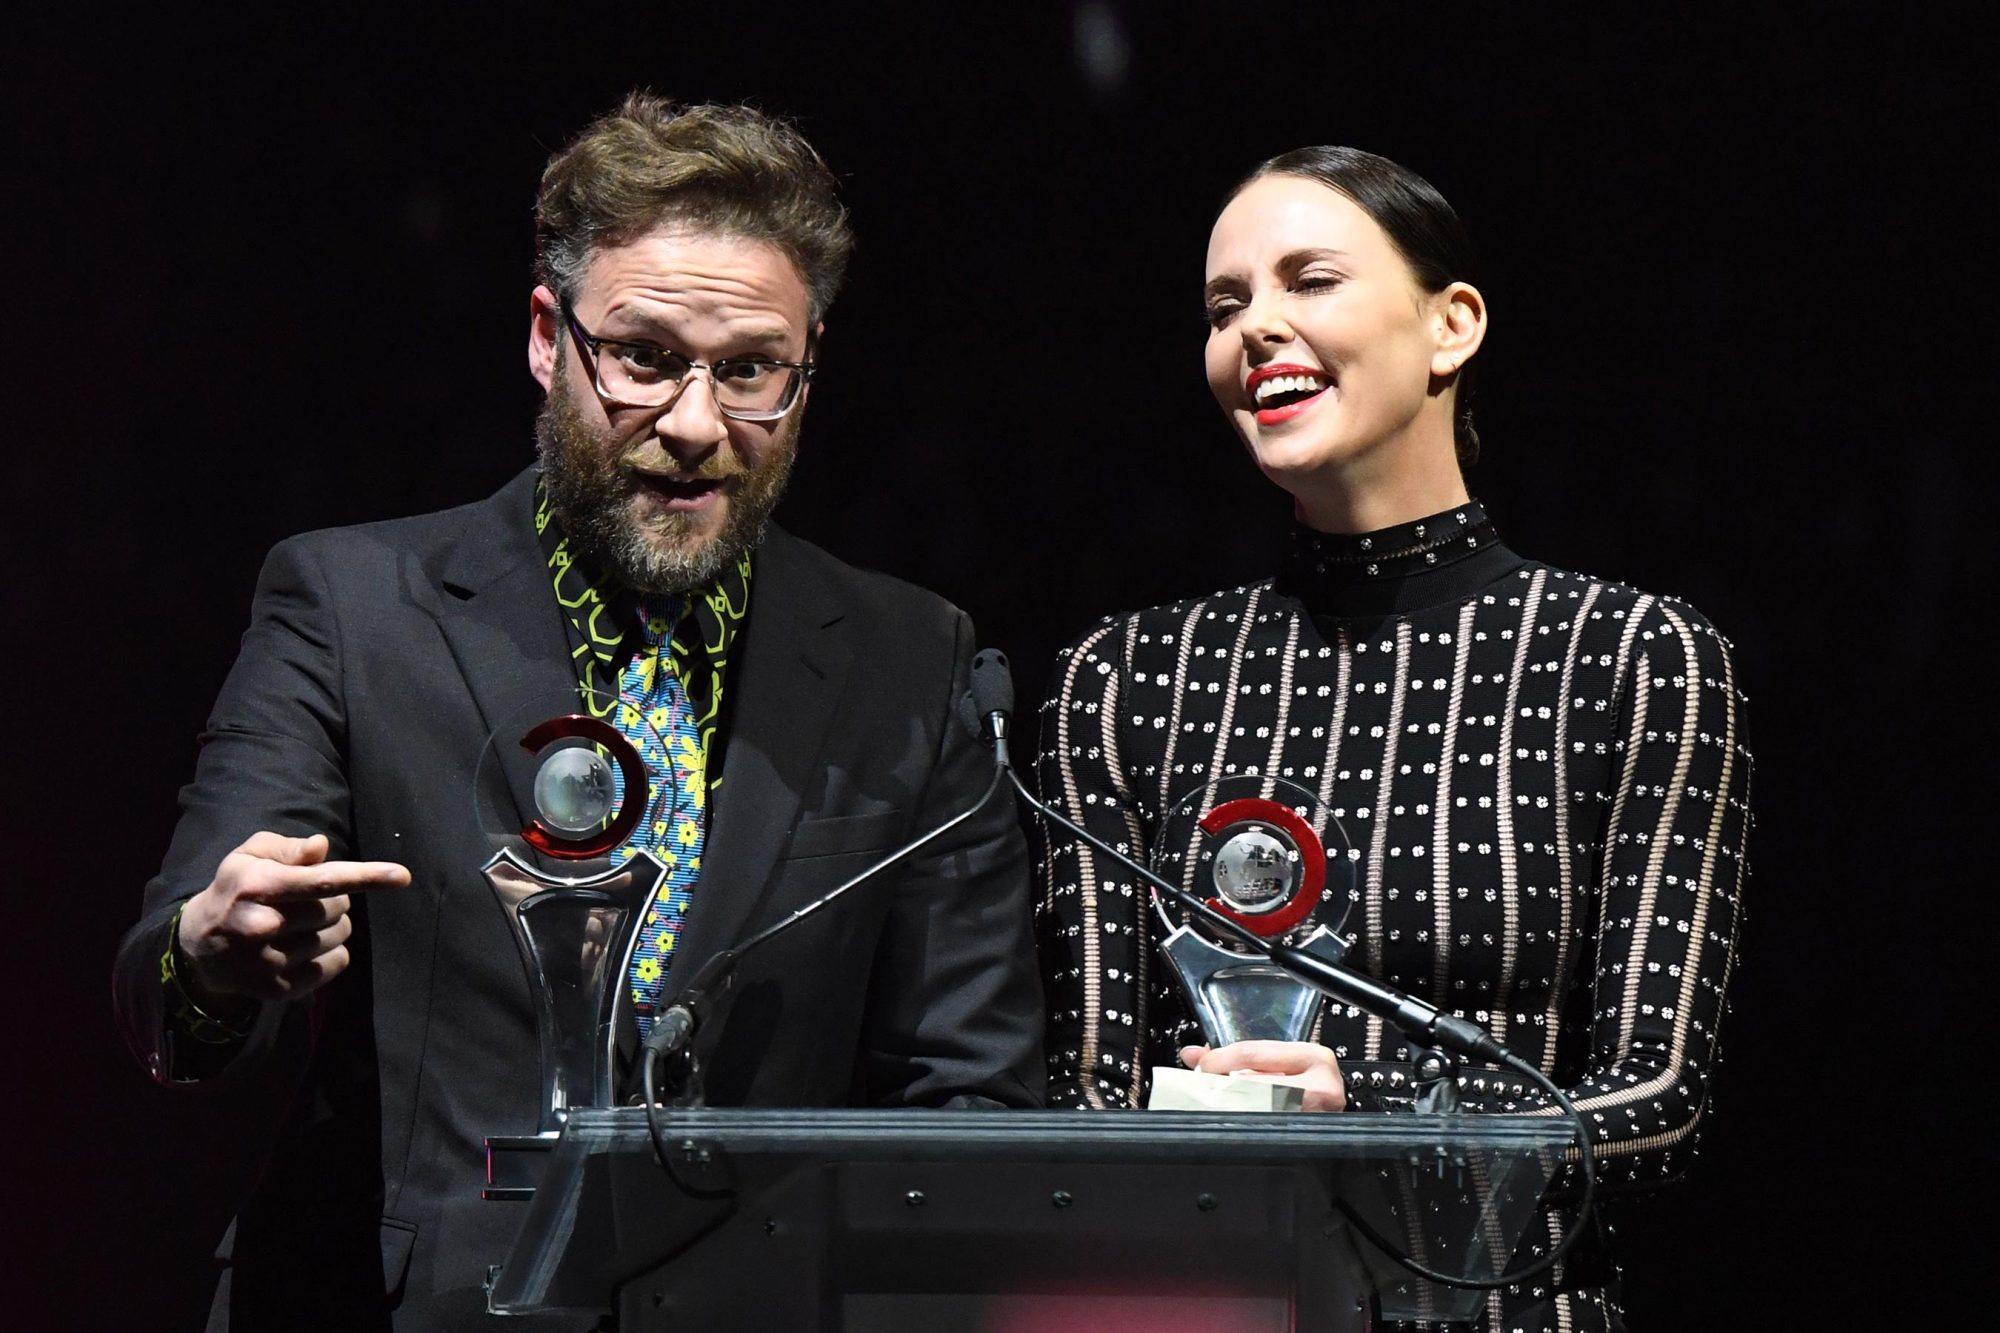 US-ENTERTAINMENT-FILM-CINEMACON-AWARD-SCREEN-AWARDS